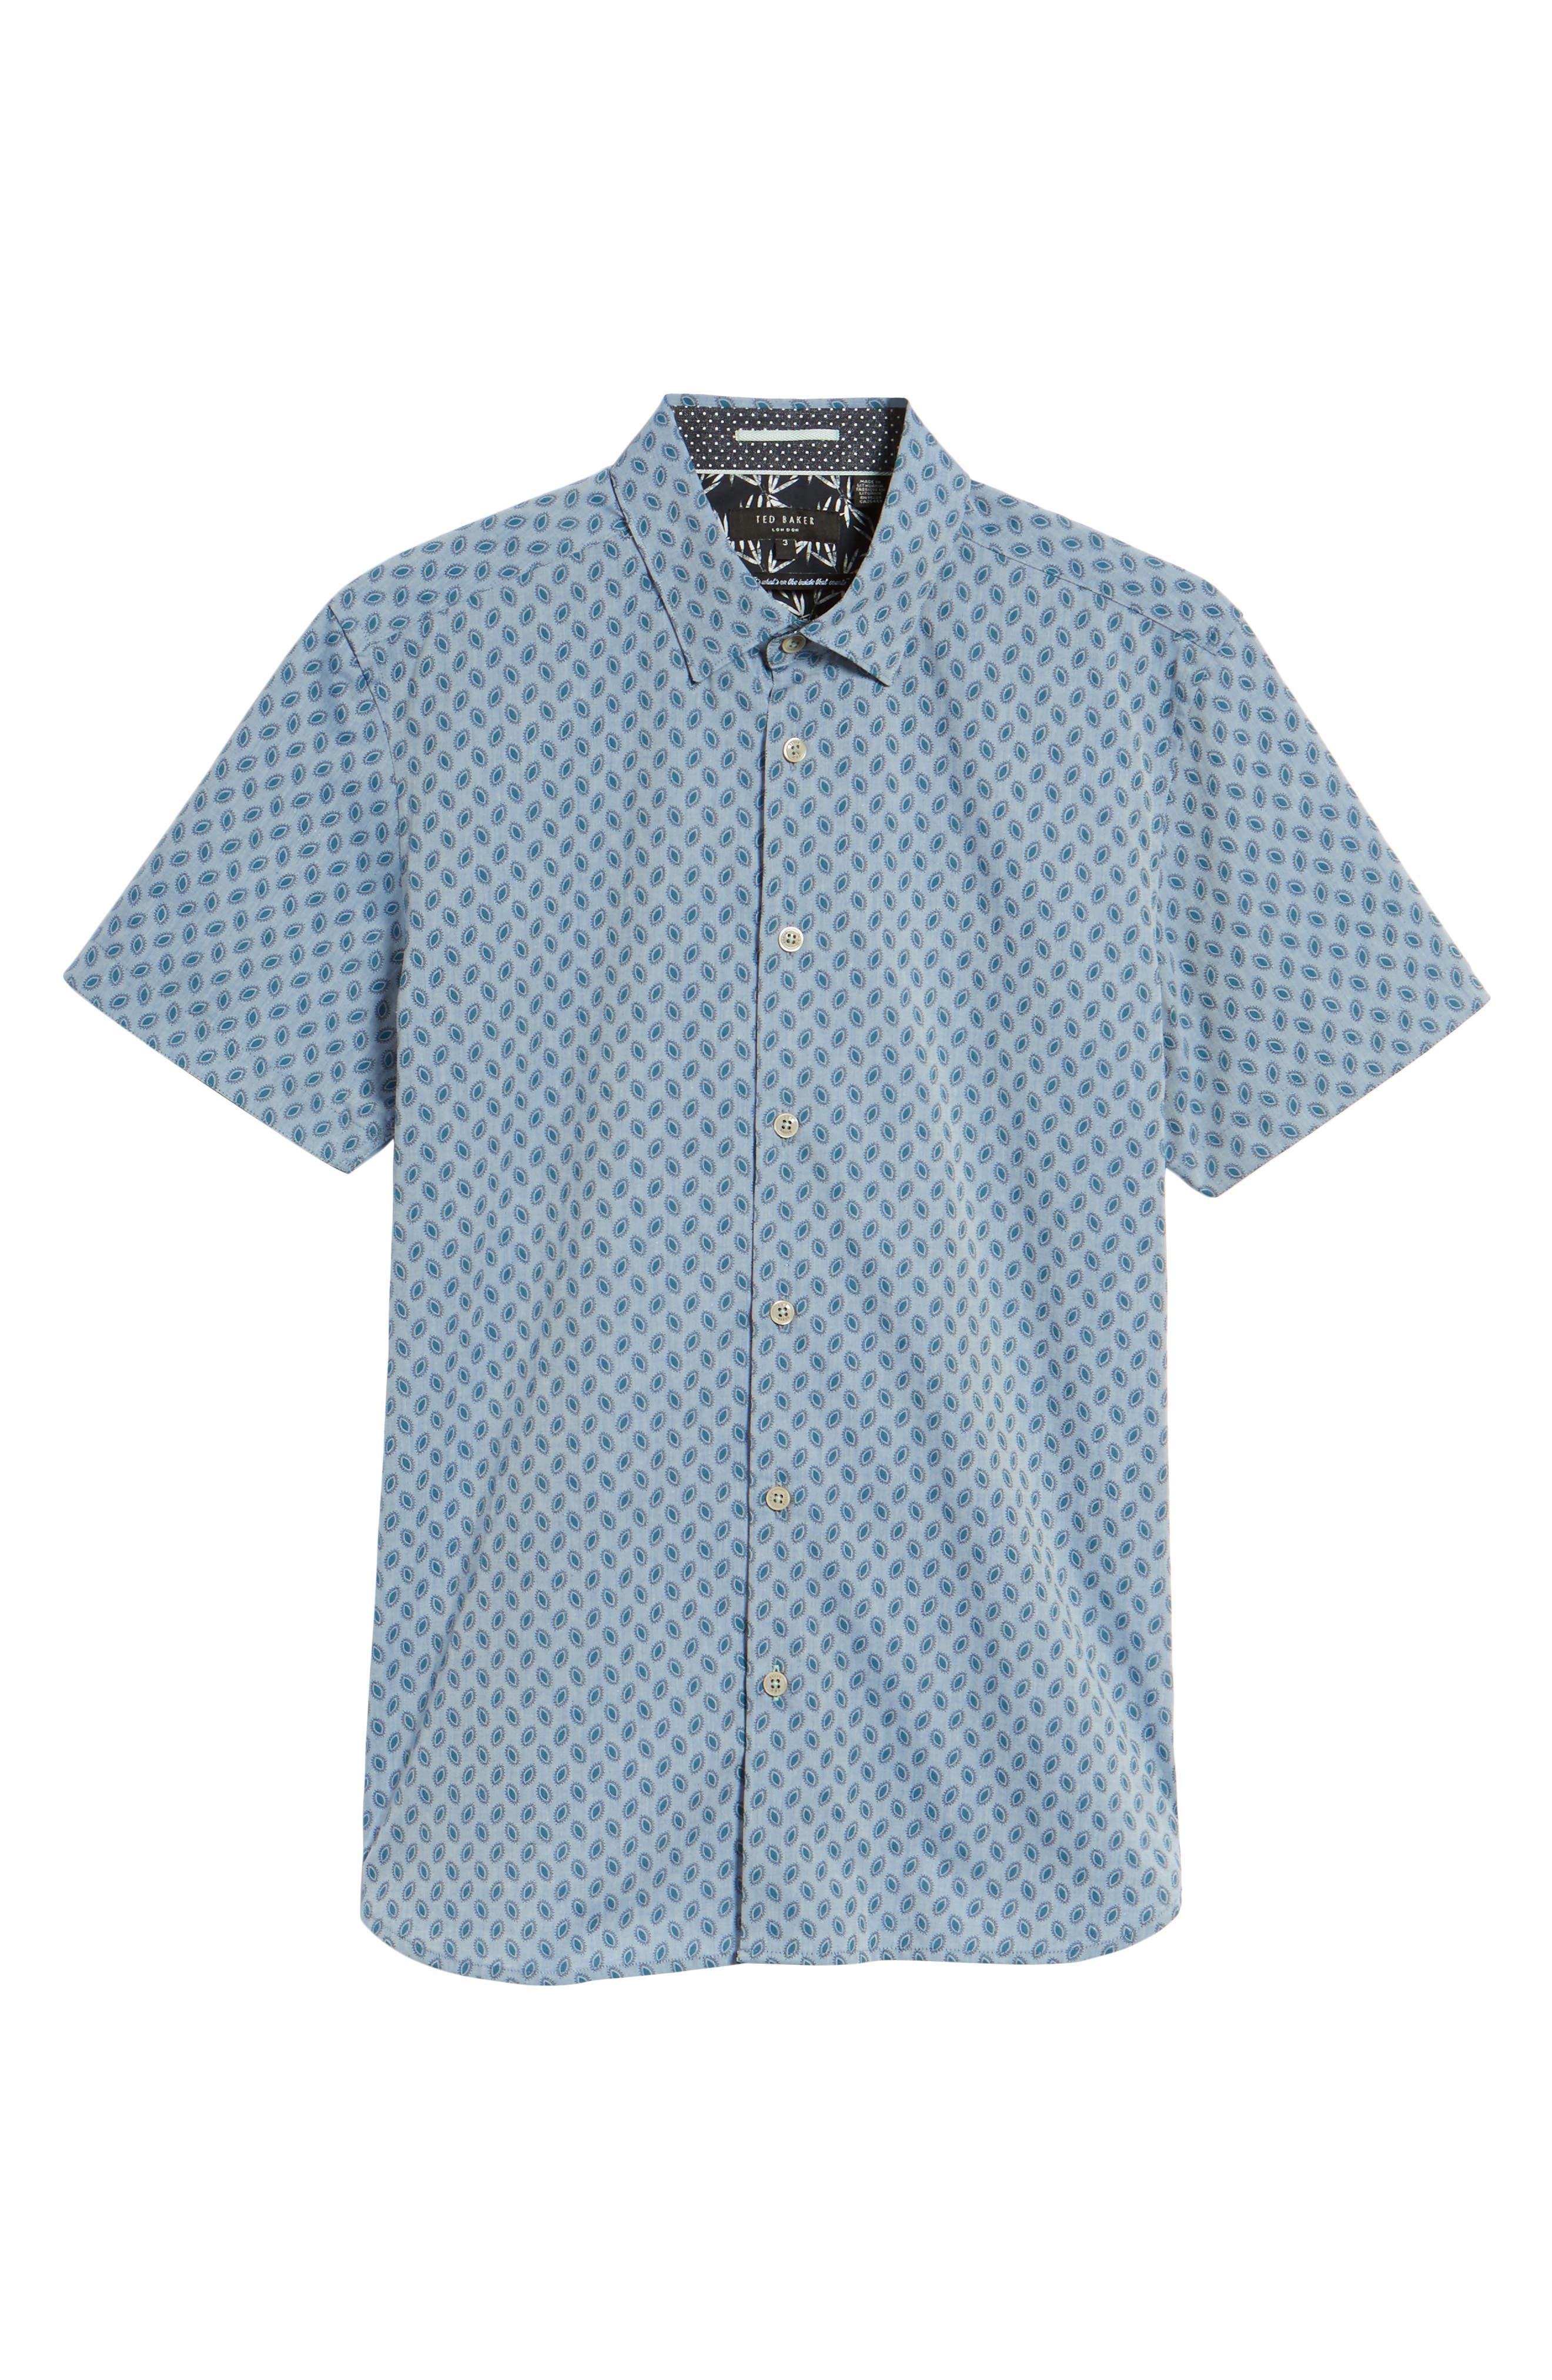 Newfott Extra Slim Fit Short Sleeve Sport Shirt,                             Alternate thumbnail 6, color,                             Blue